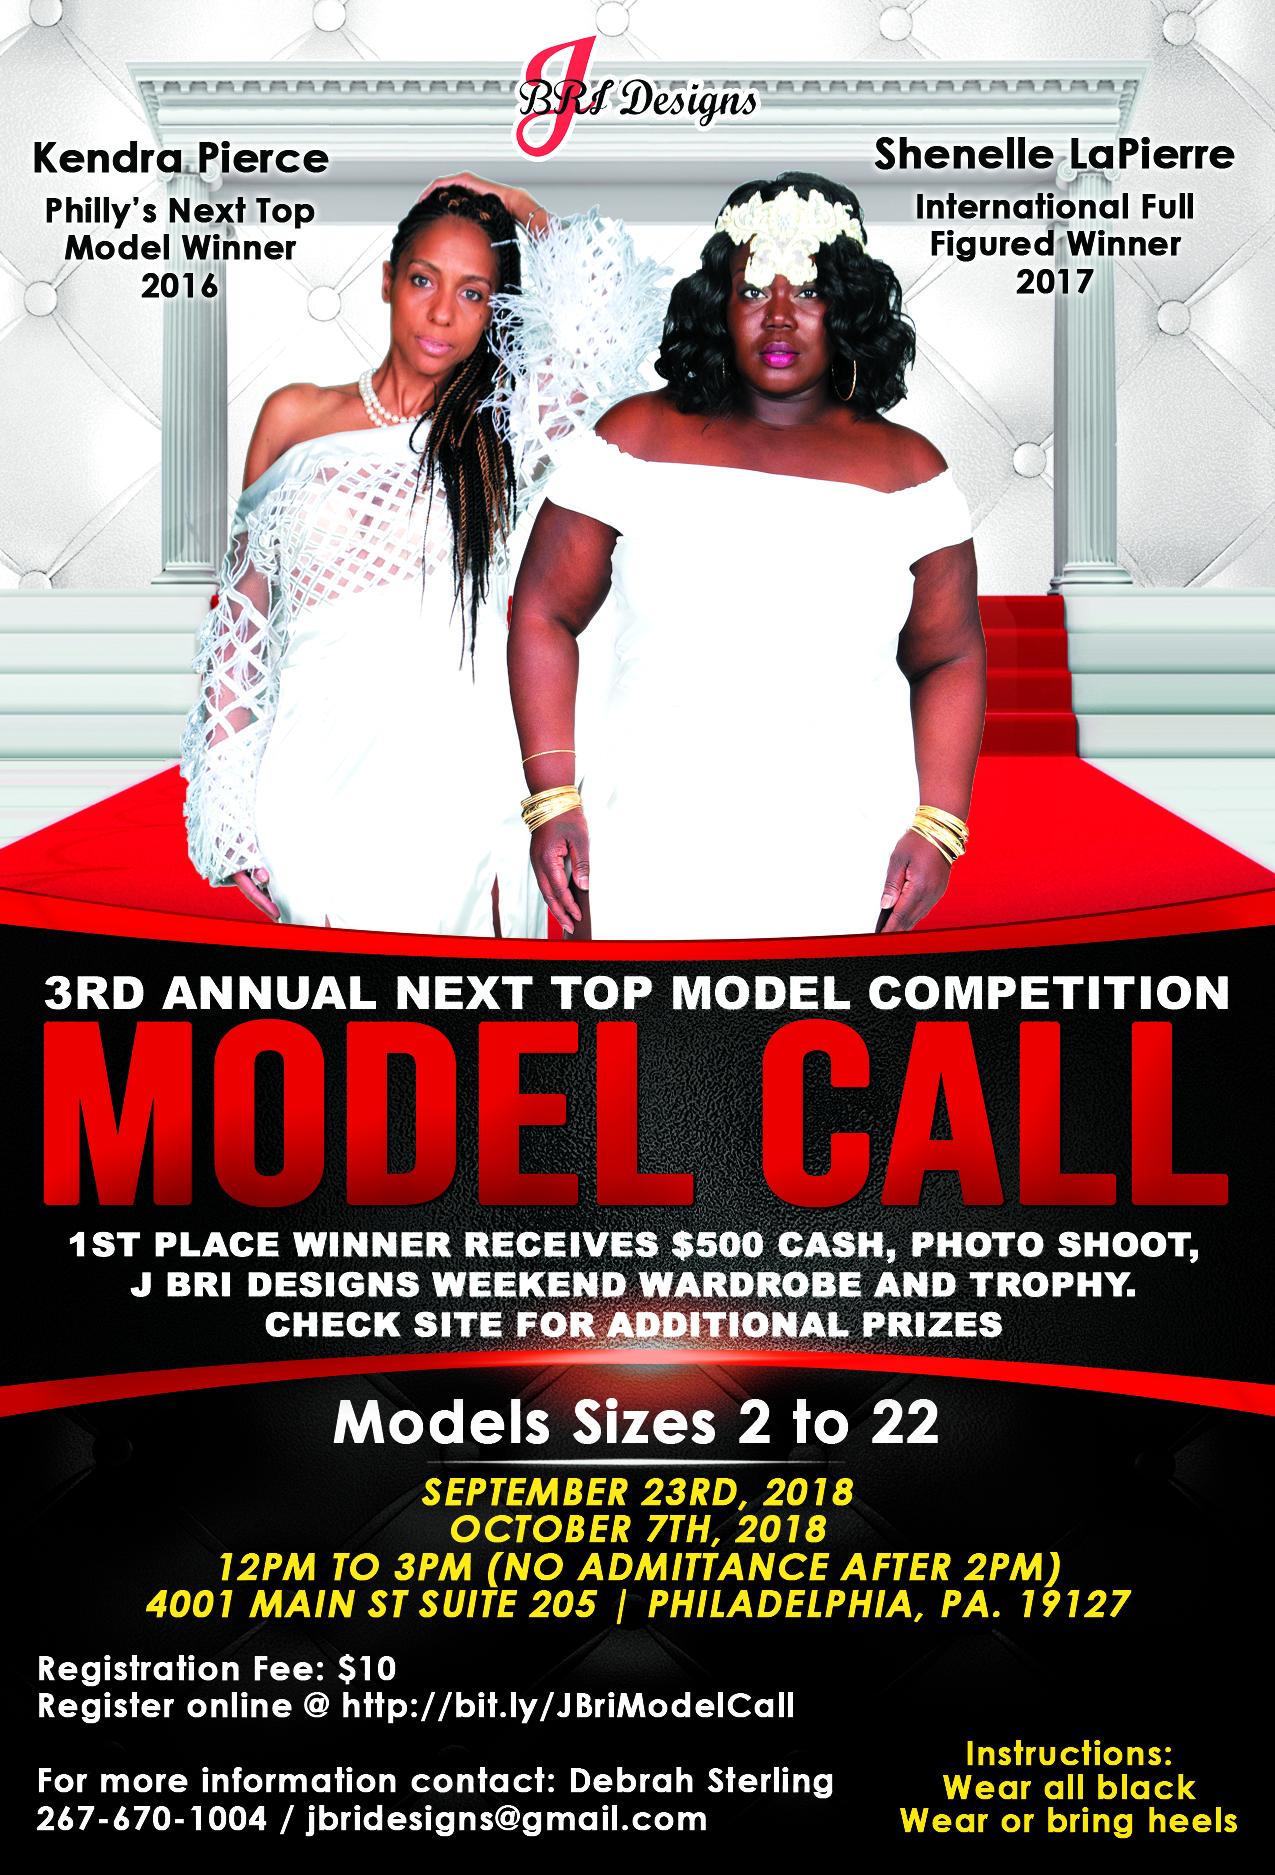 model-call-oct7th.jpg